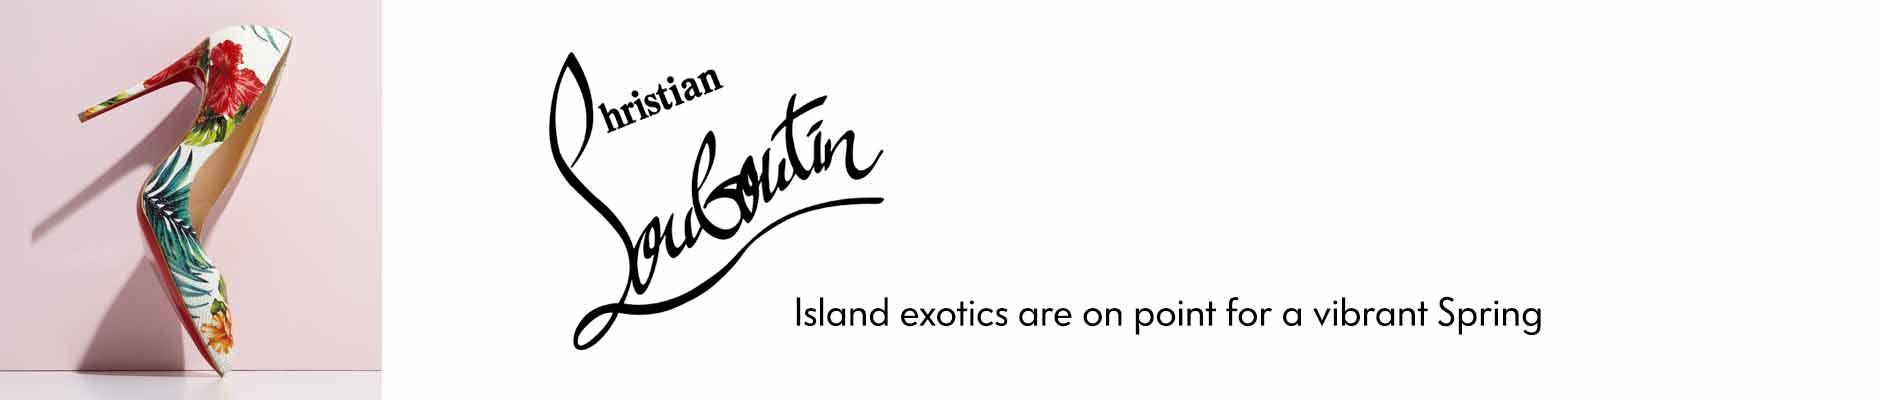 Christian Louboutin Shoes \u0026amp; Christian Louboutin Pumps | Neiman Marcus